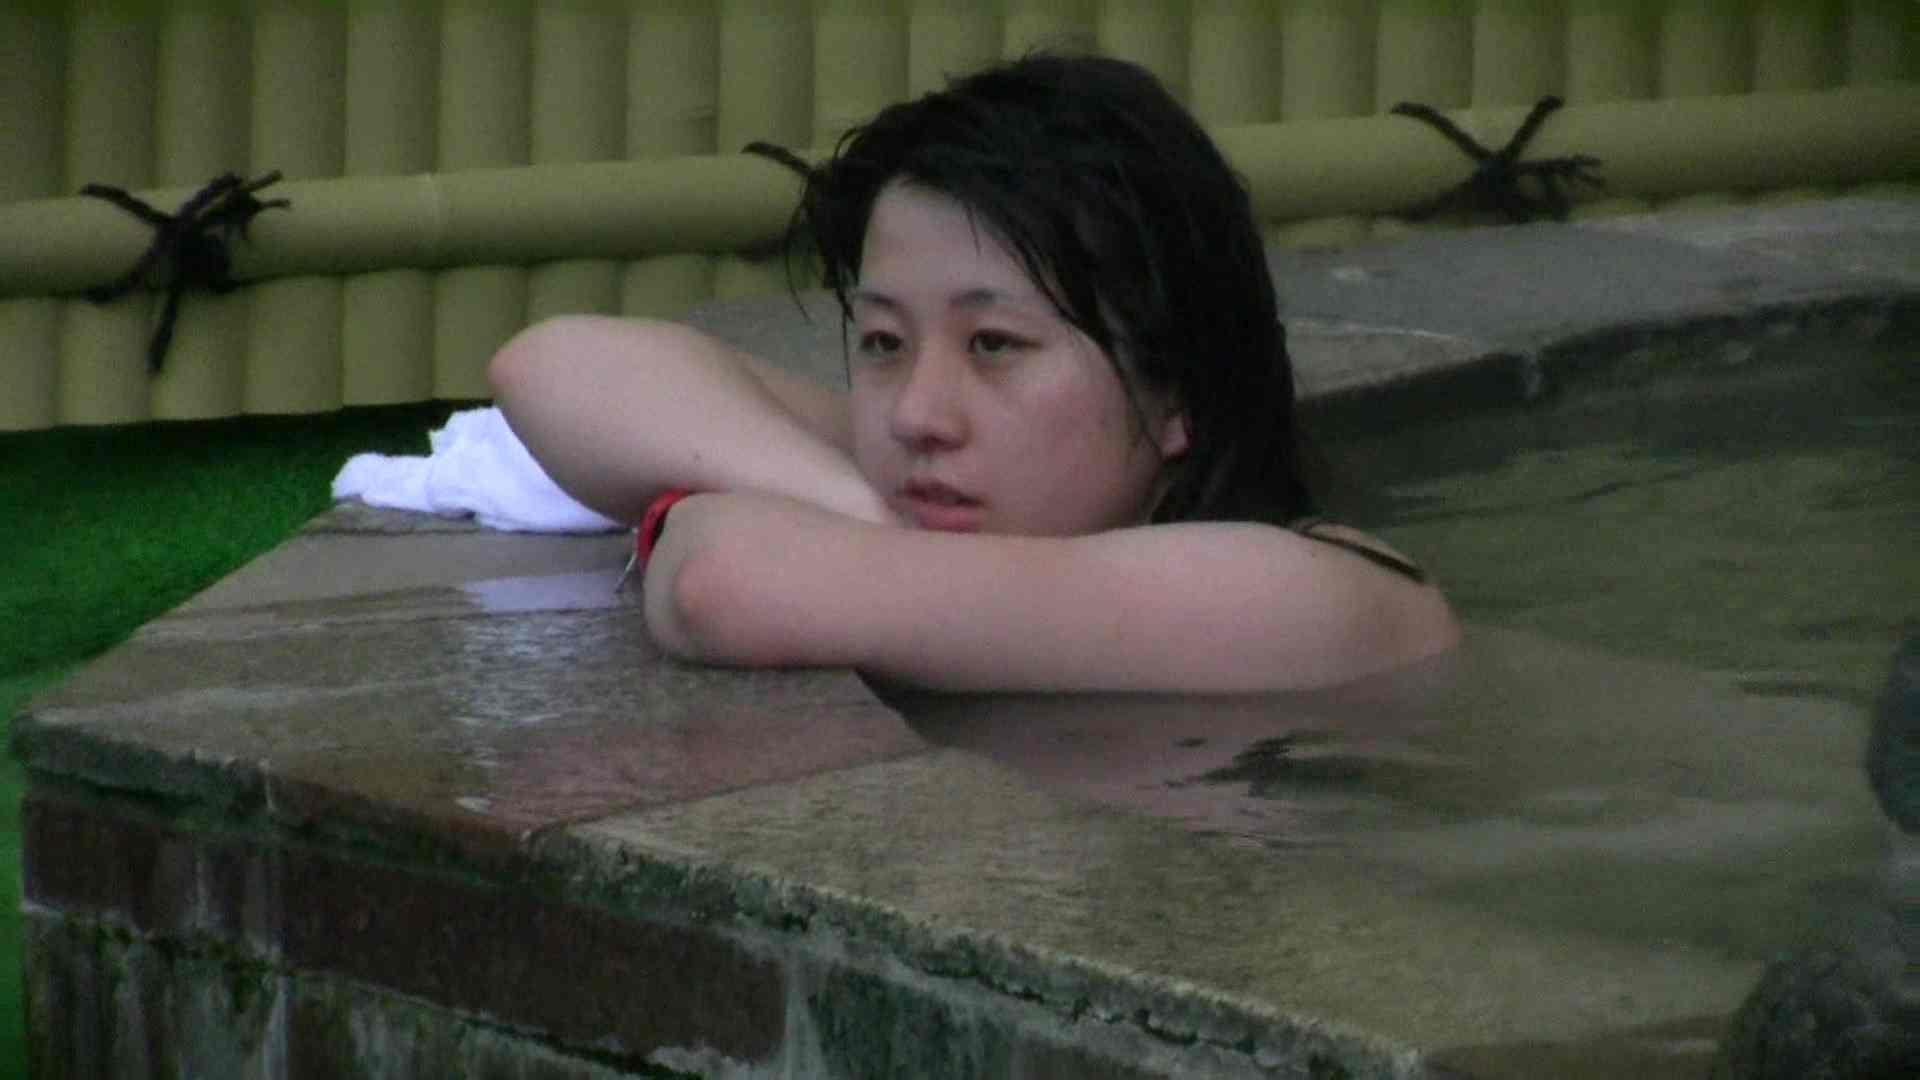 Aquaな露天風呂Vol.541 露天風呂編 | 盗撮シリーズ  88PIX 39